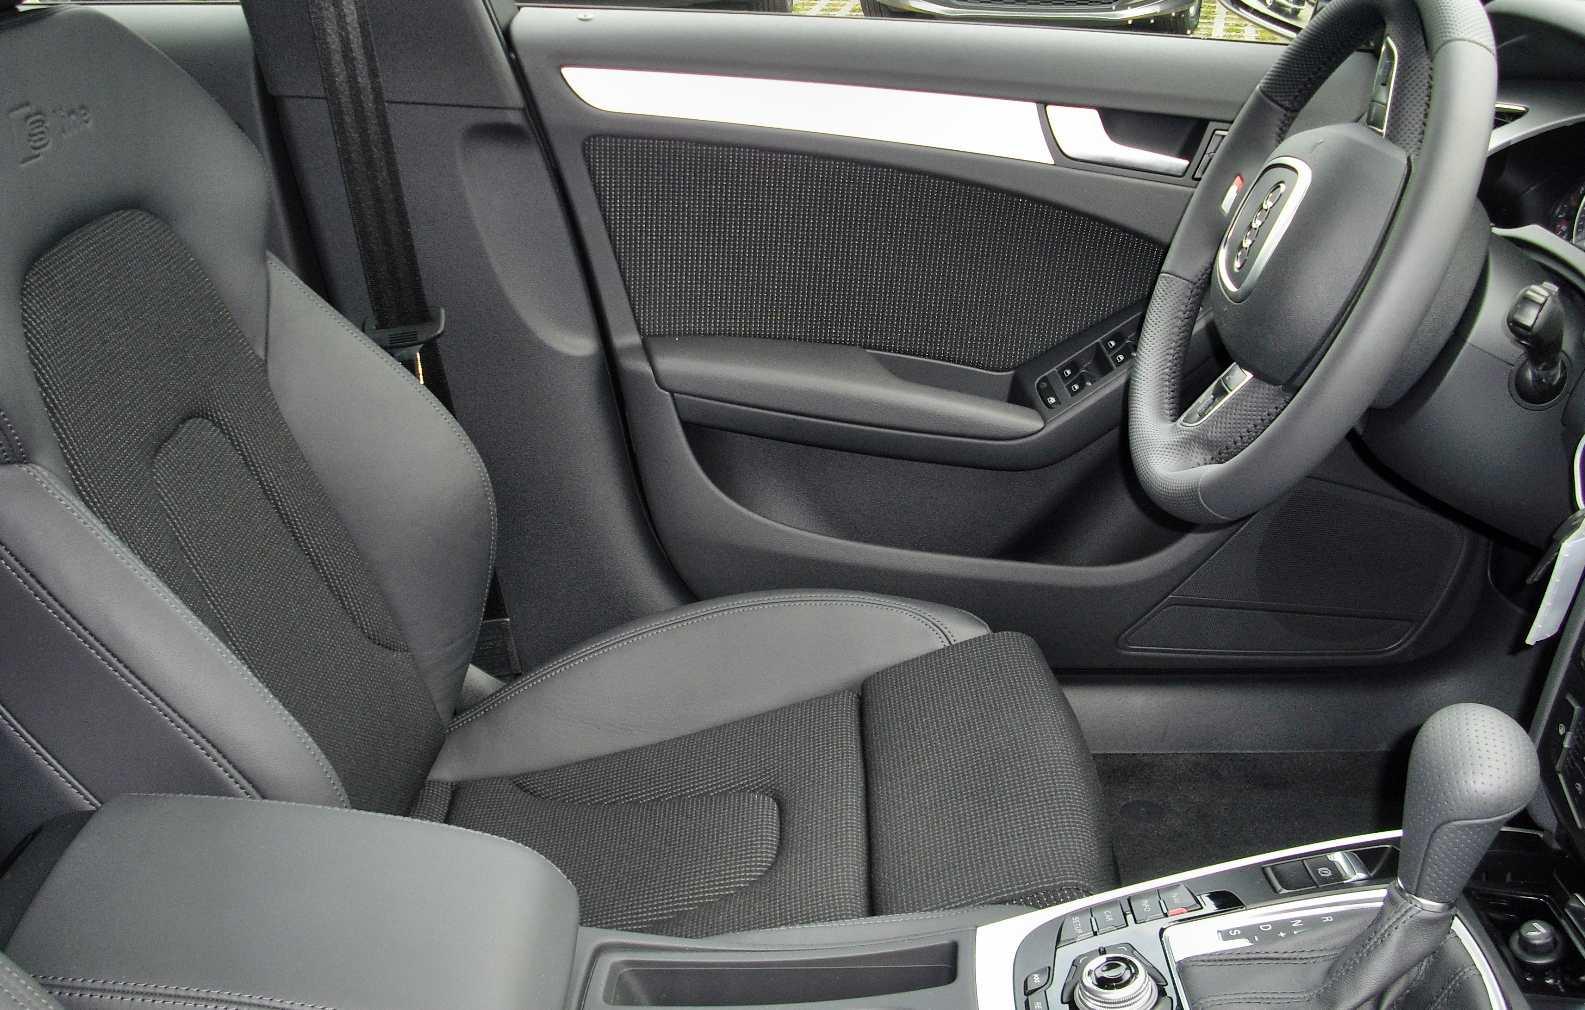 Audi A4 Avant S Line Neues Modell Modelljahr 2015 2014 2 0